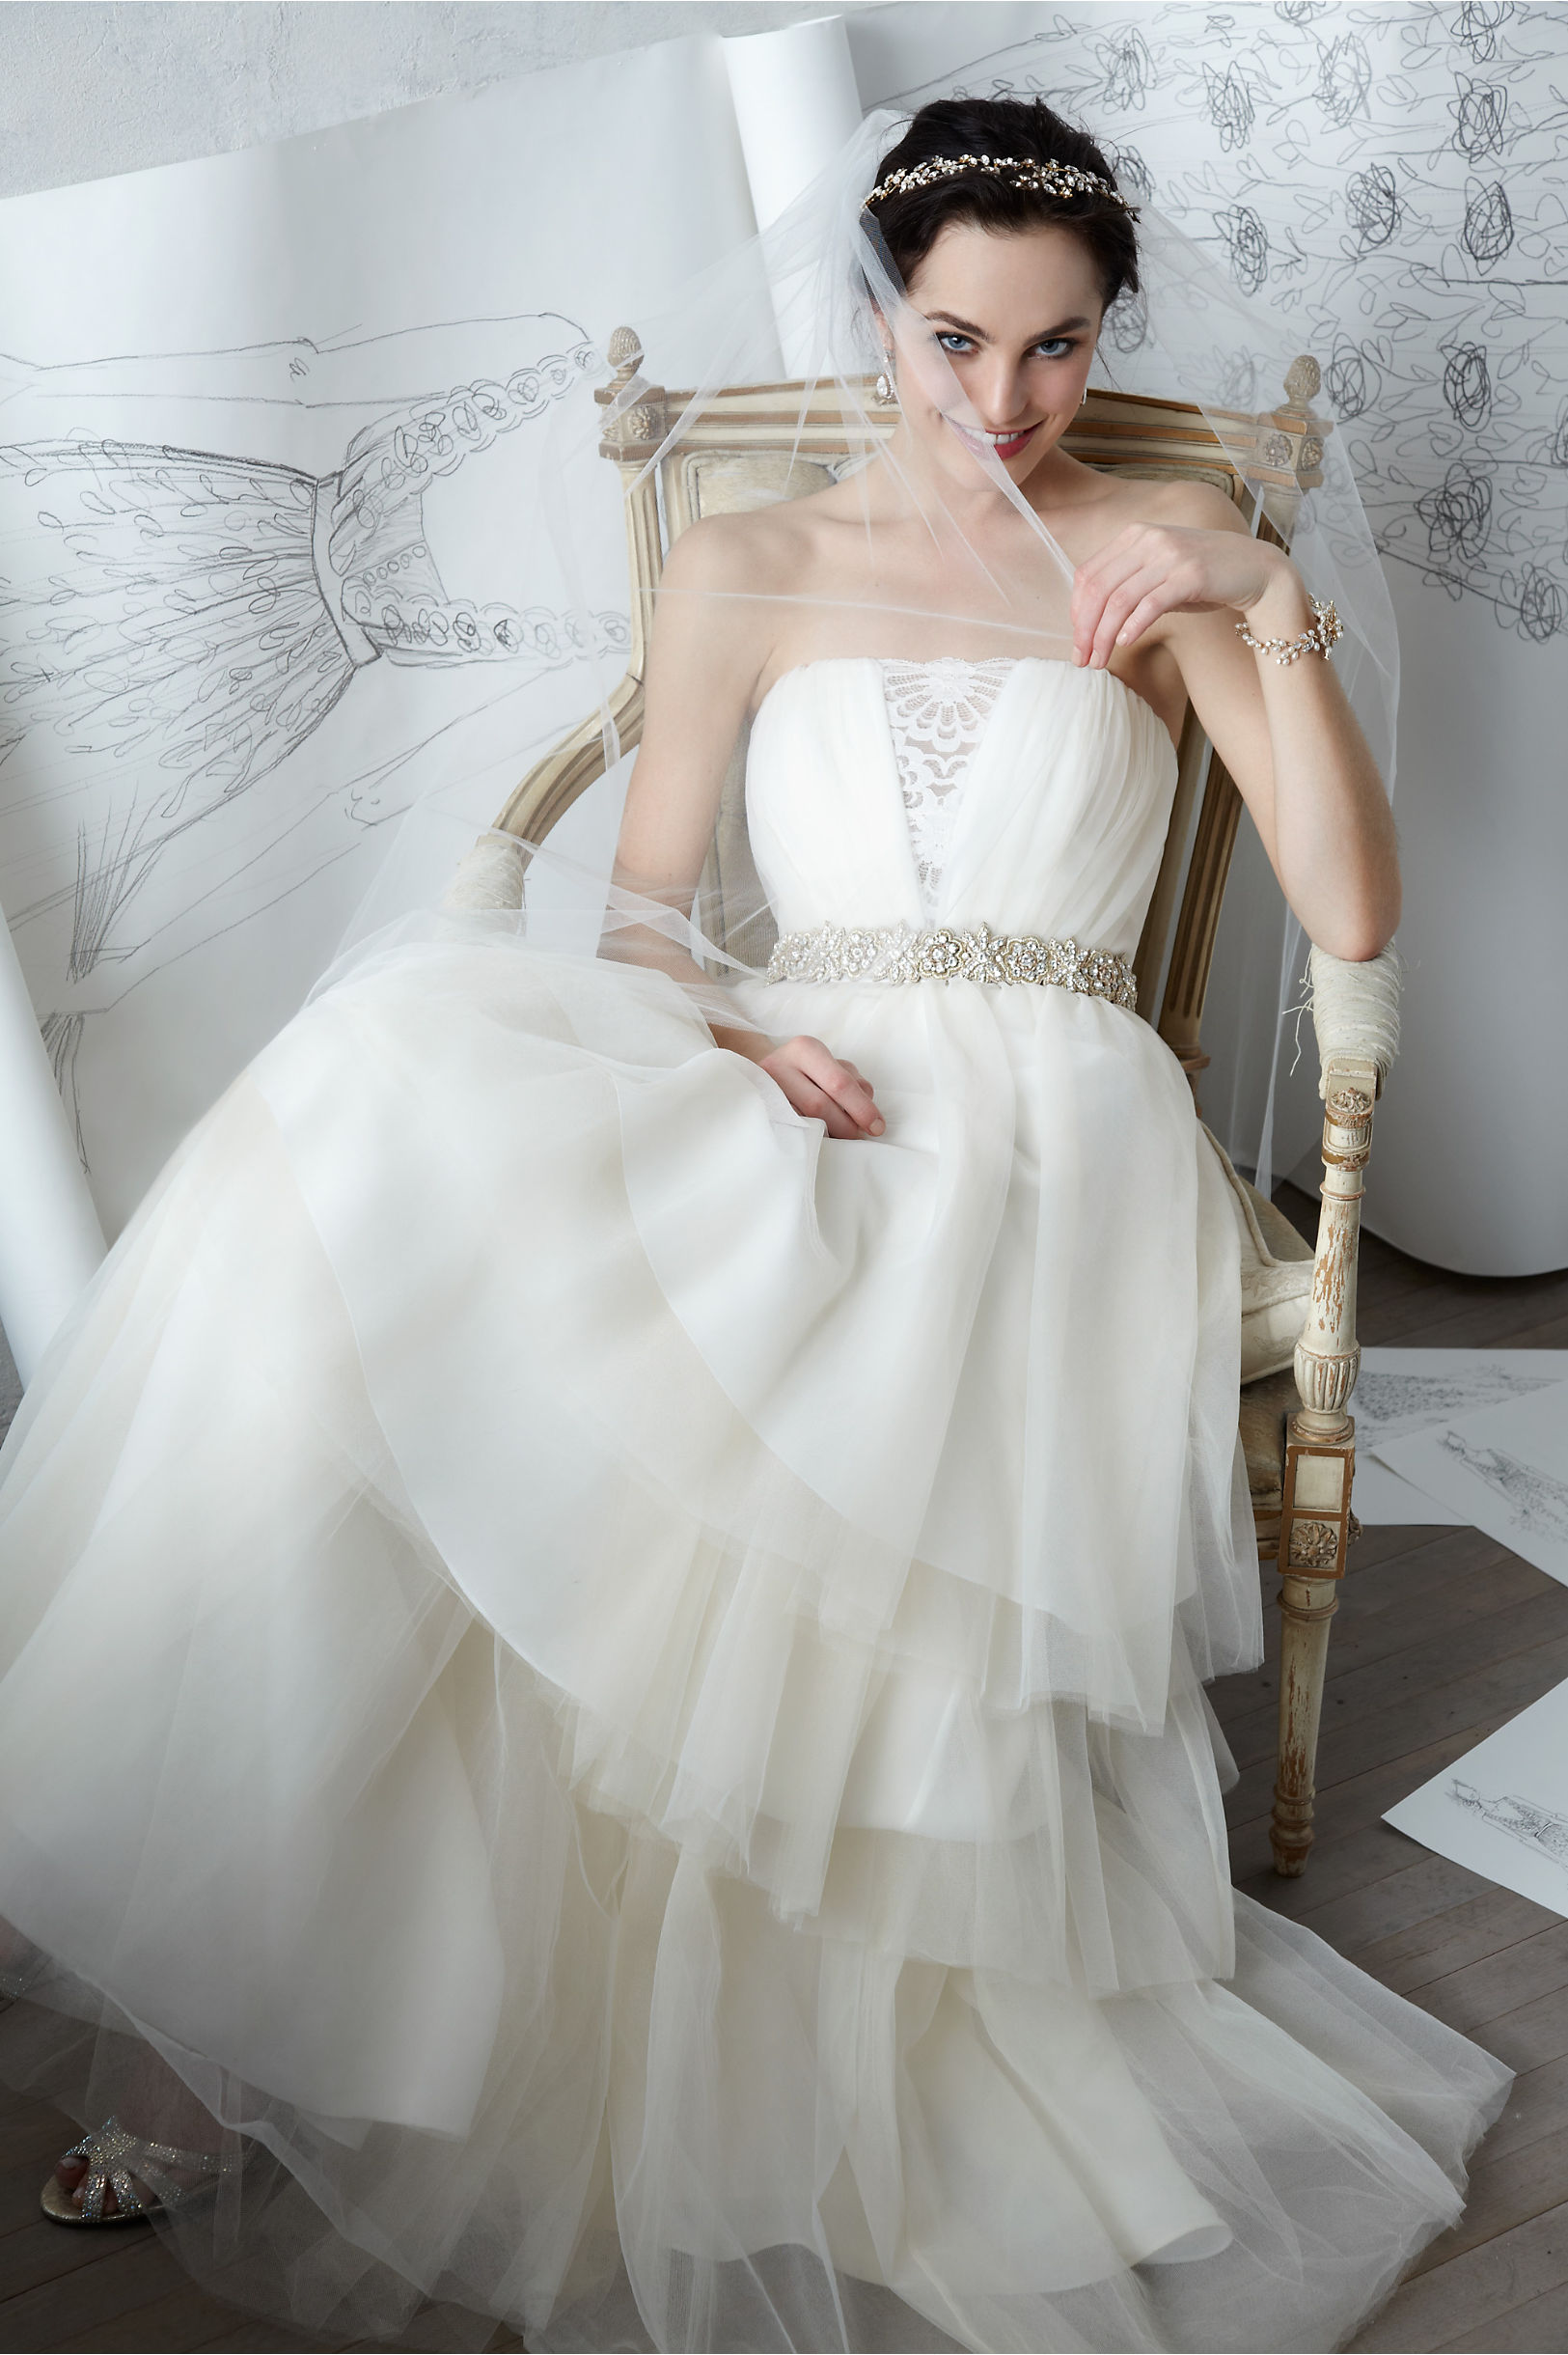 Badgley Mischka Plus Size Dresses Gallery - simple casual dress designs